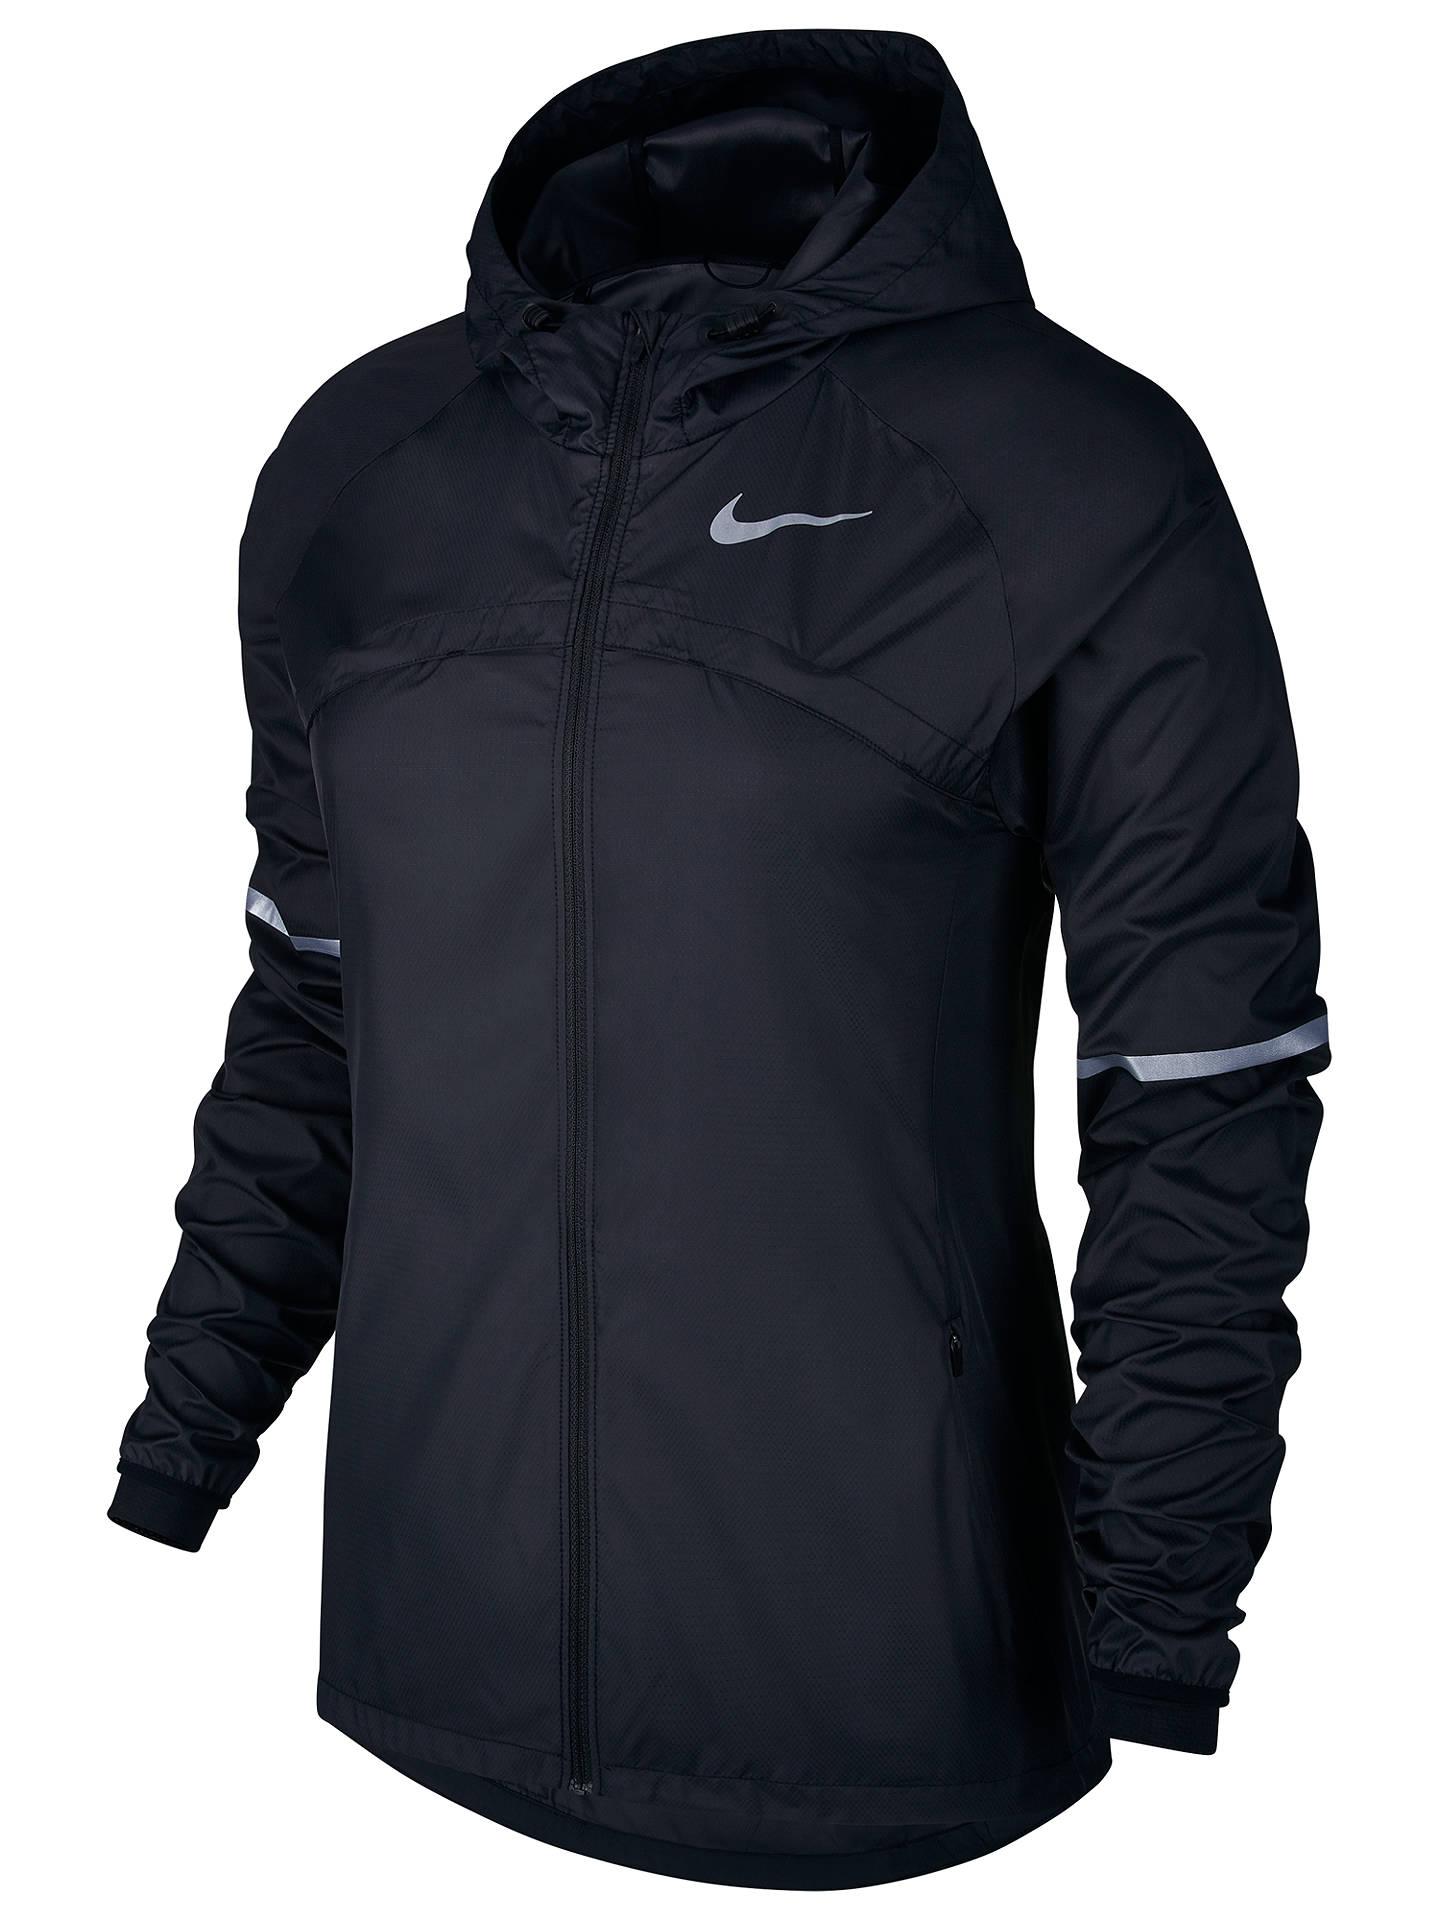 Minimizar Frustración un acreedor  Nike Shield Hooded Women's Running Jacket, Black at John Lewis & Partners